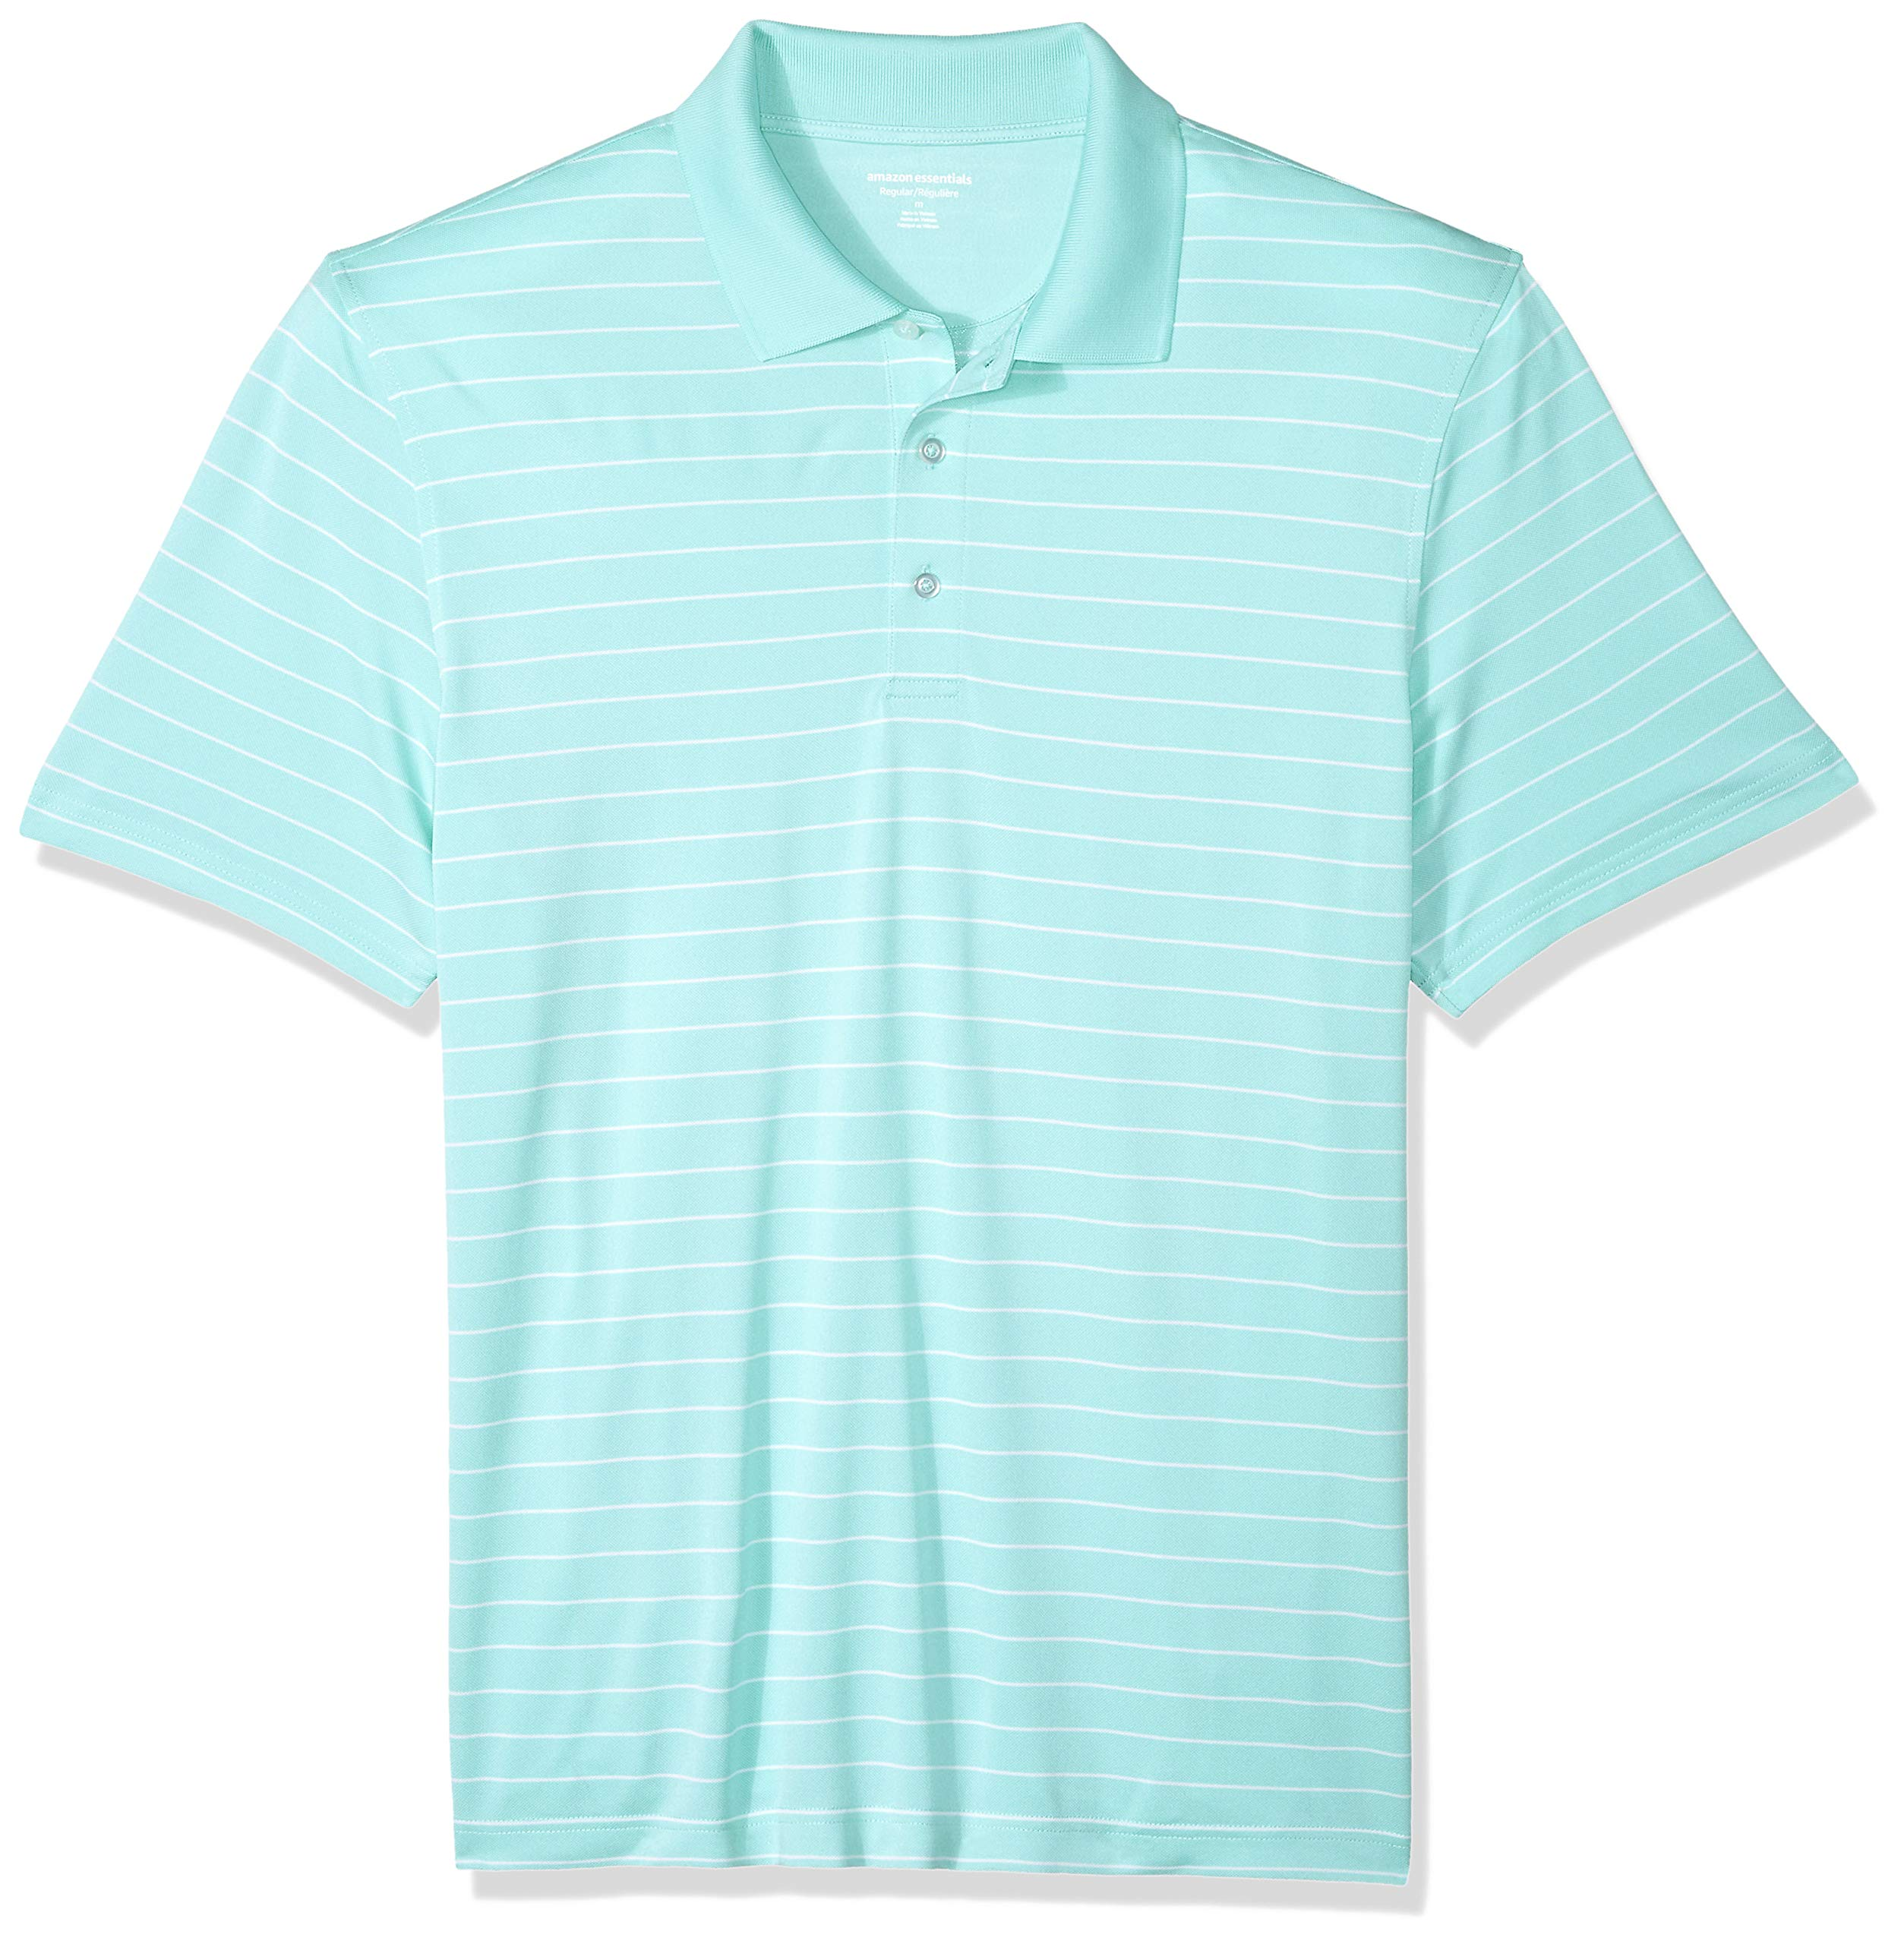 Amazon Essentials Men's Regular-Fit Quick-Dry Golf Polo Shirt, Aqua Stripe, X-Small by Amazon Essentials